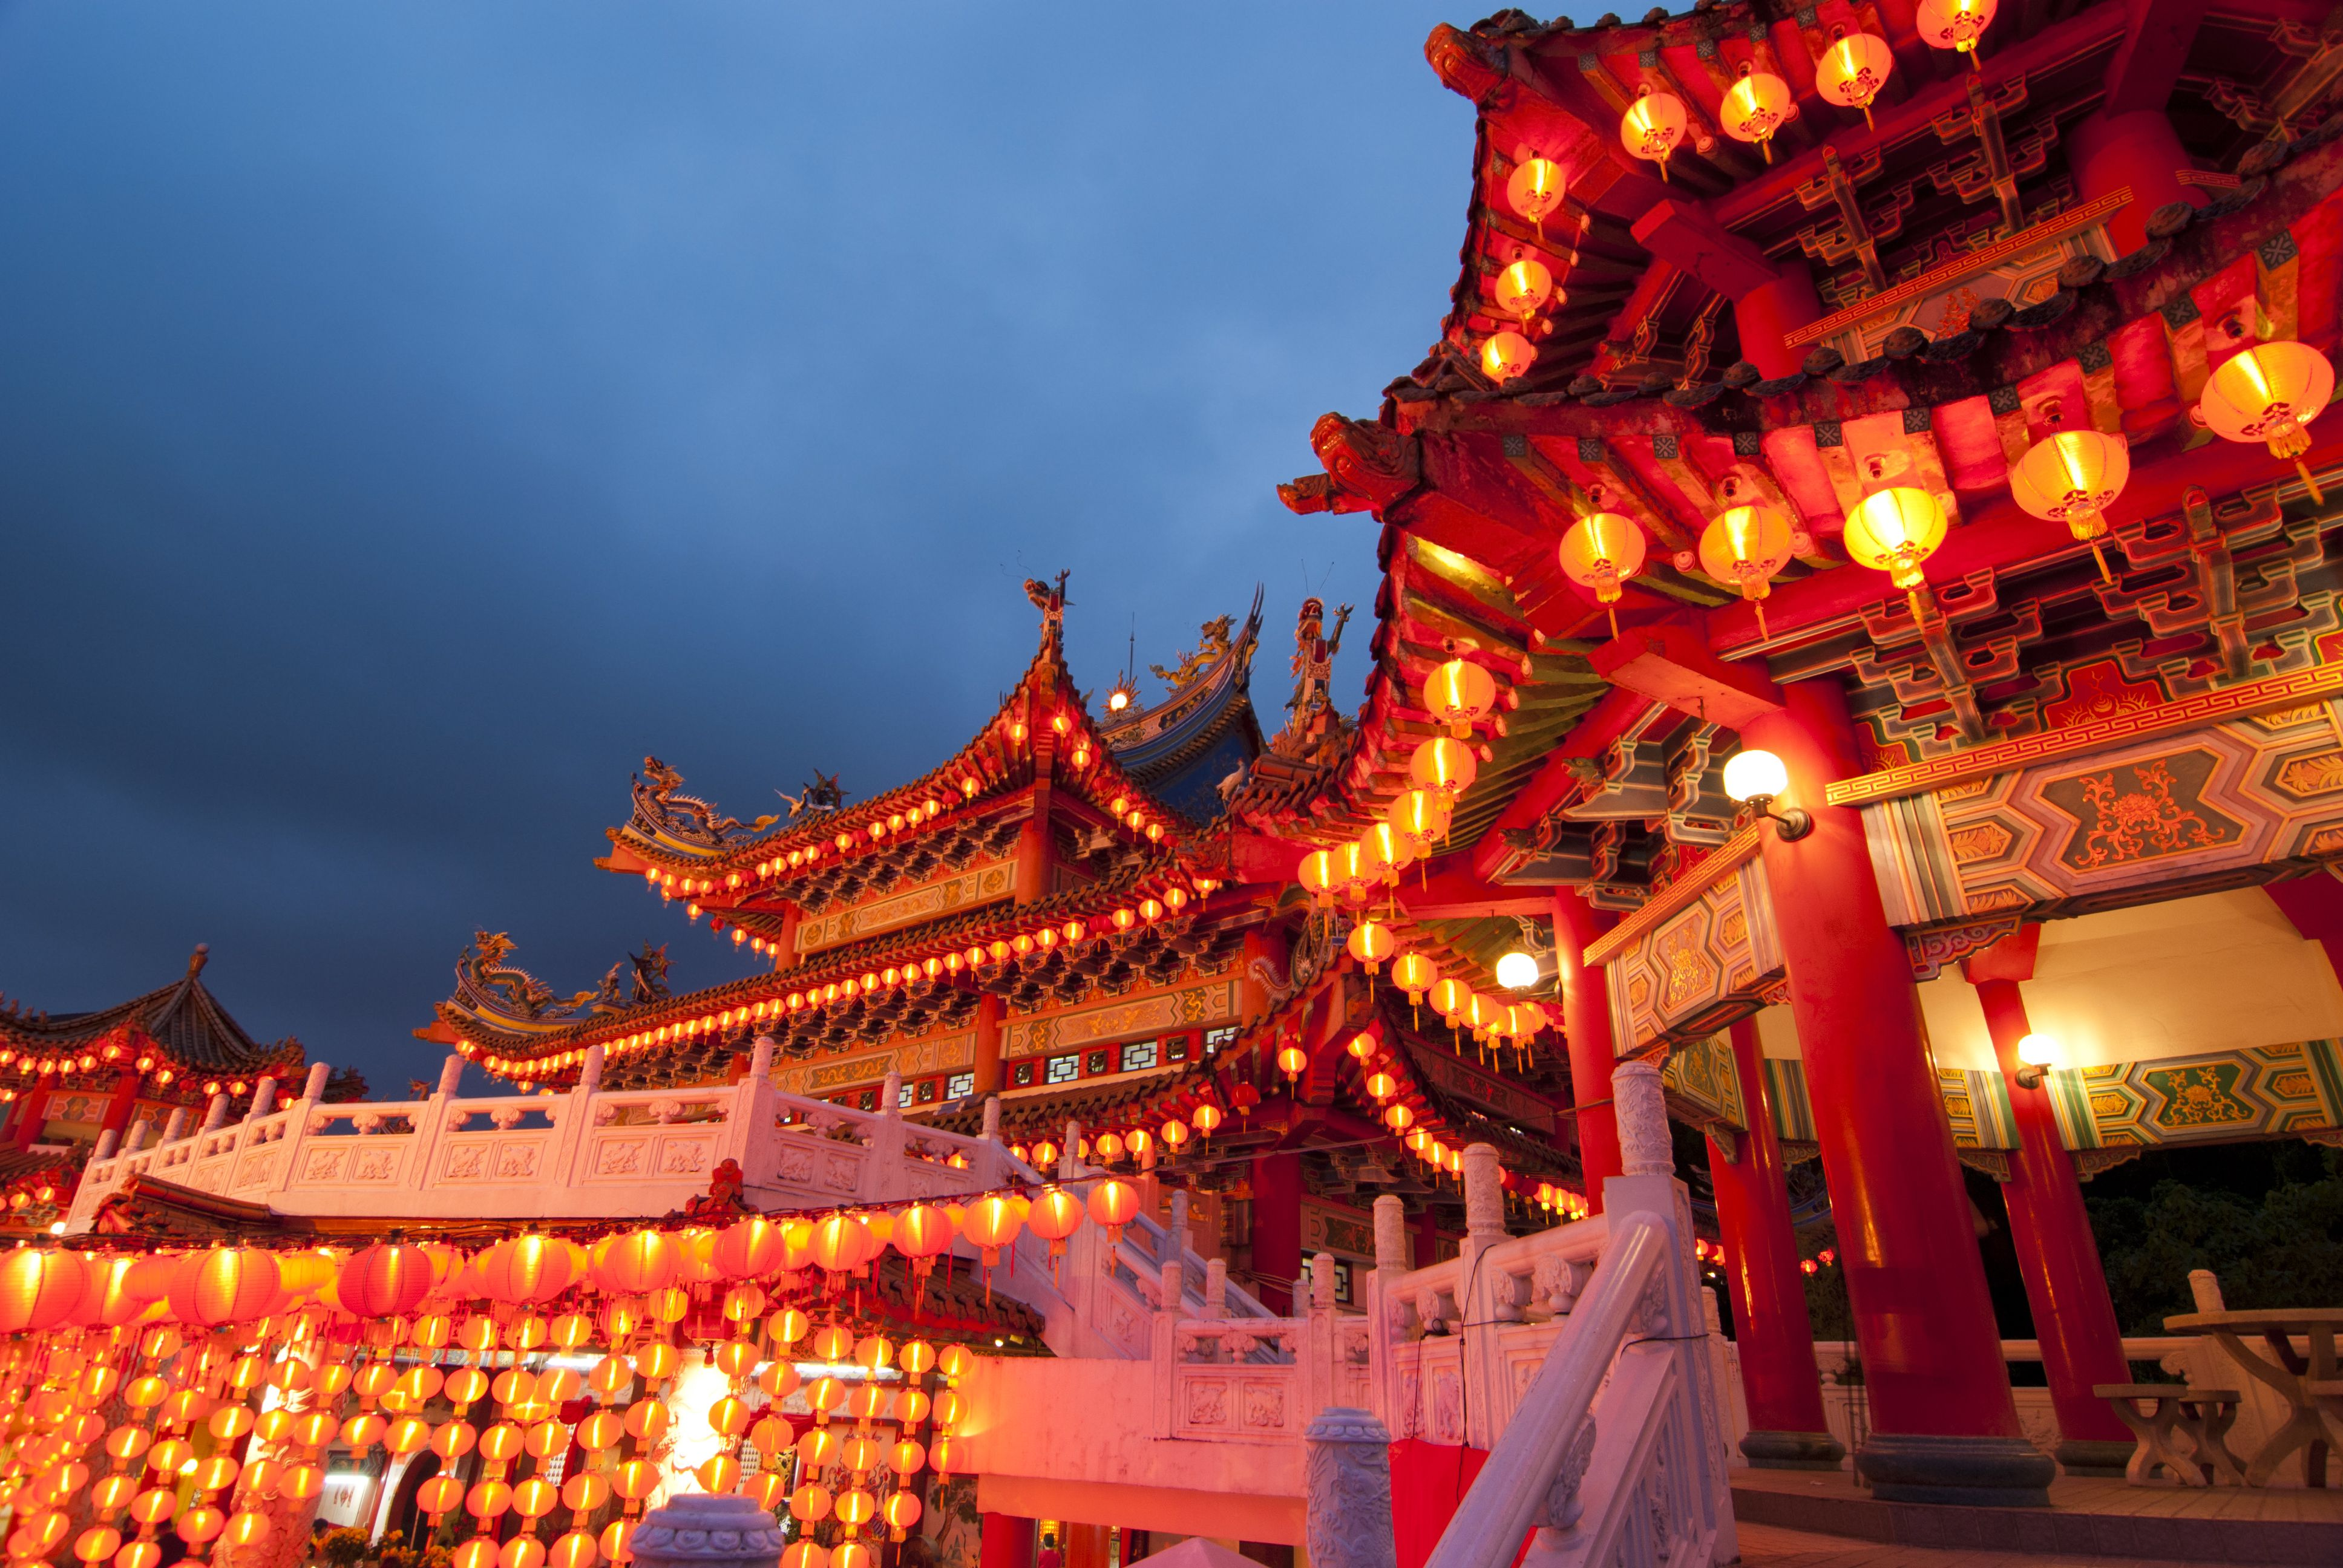 Chinese New Year At Thean Hou Temple In Kuala Lumpur Malaysia C Wong Yu Liang Dreamstime Fondos De Pantalla Fondos